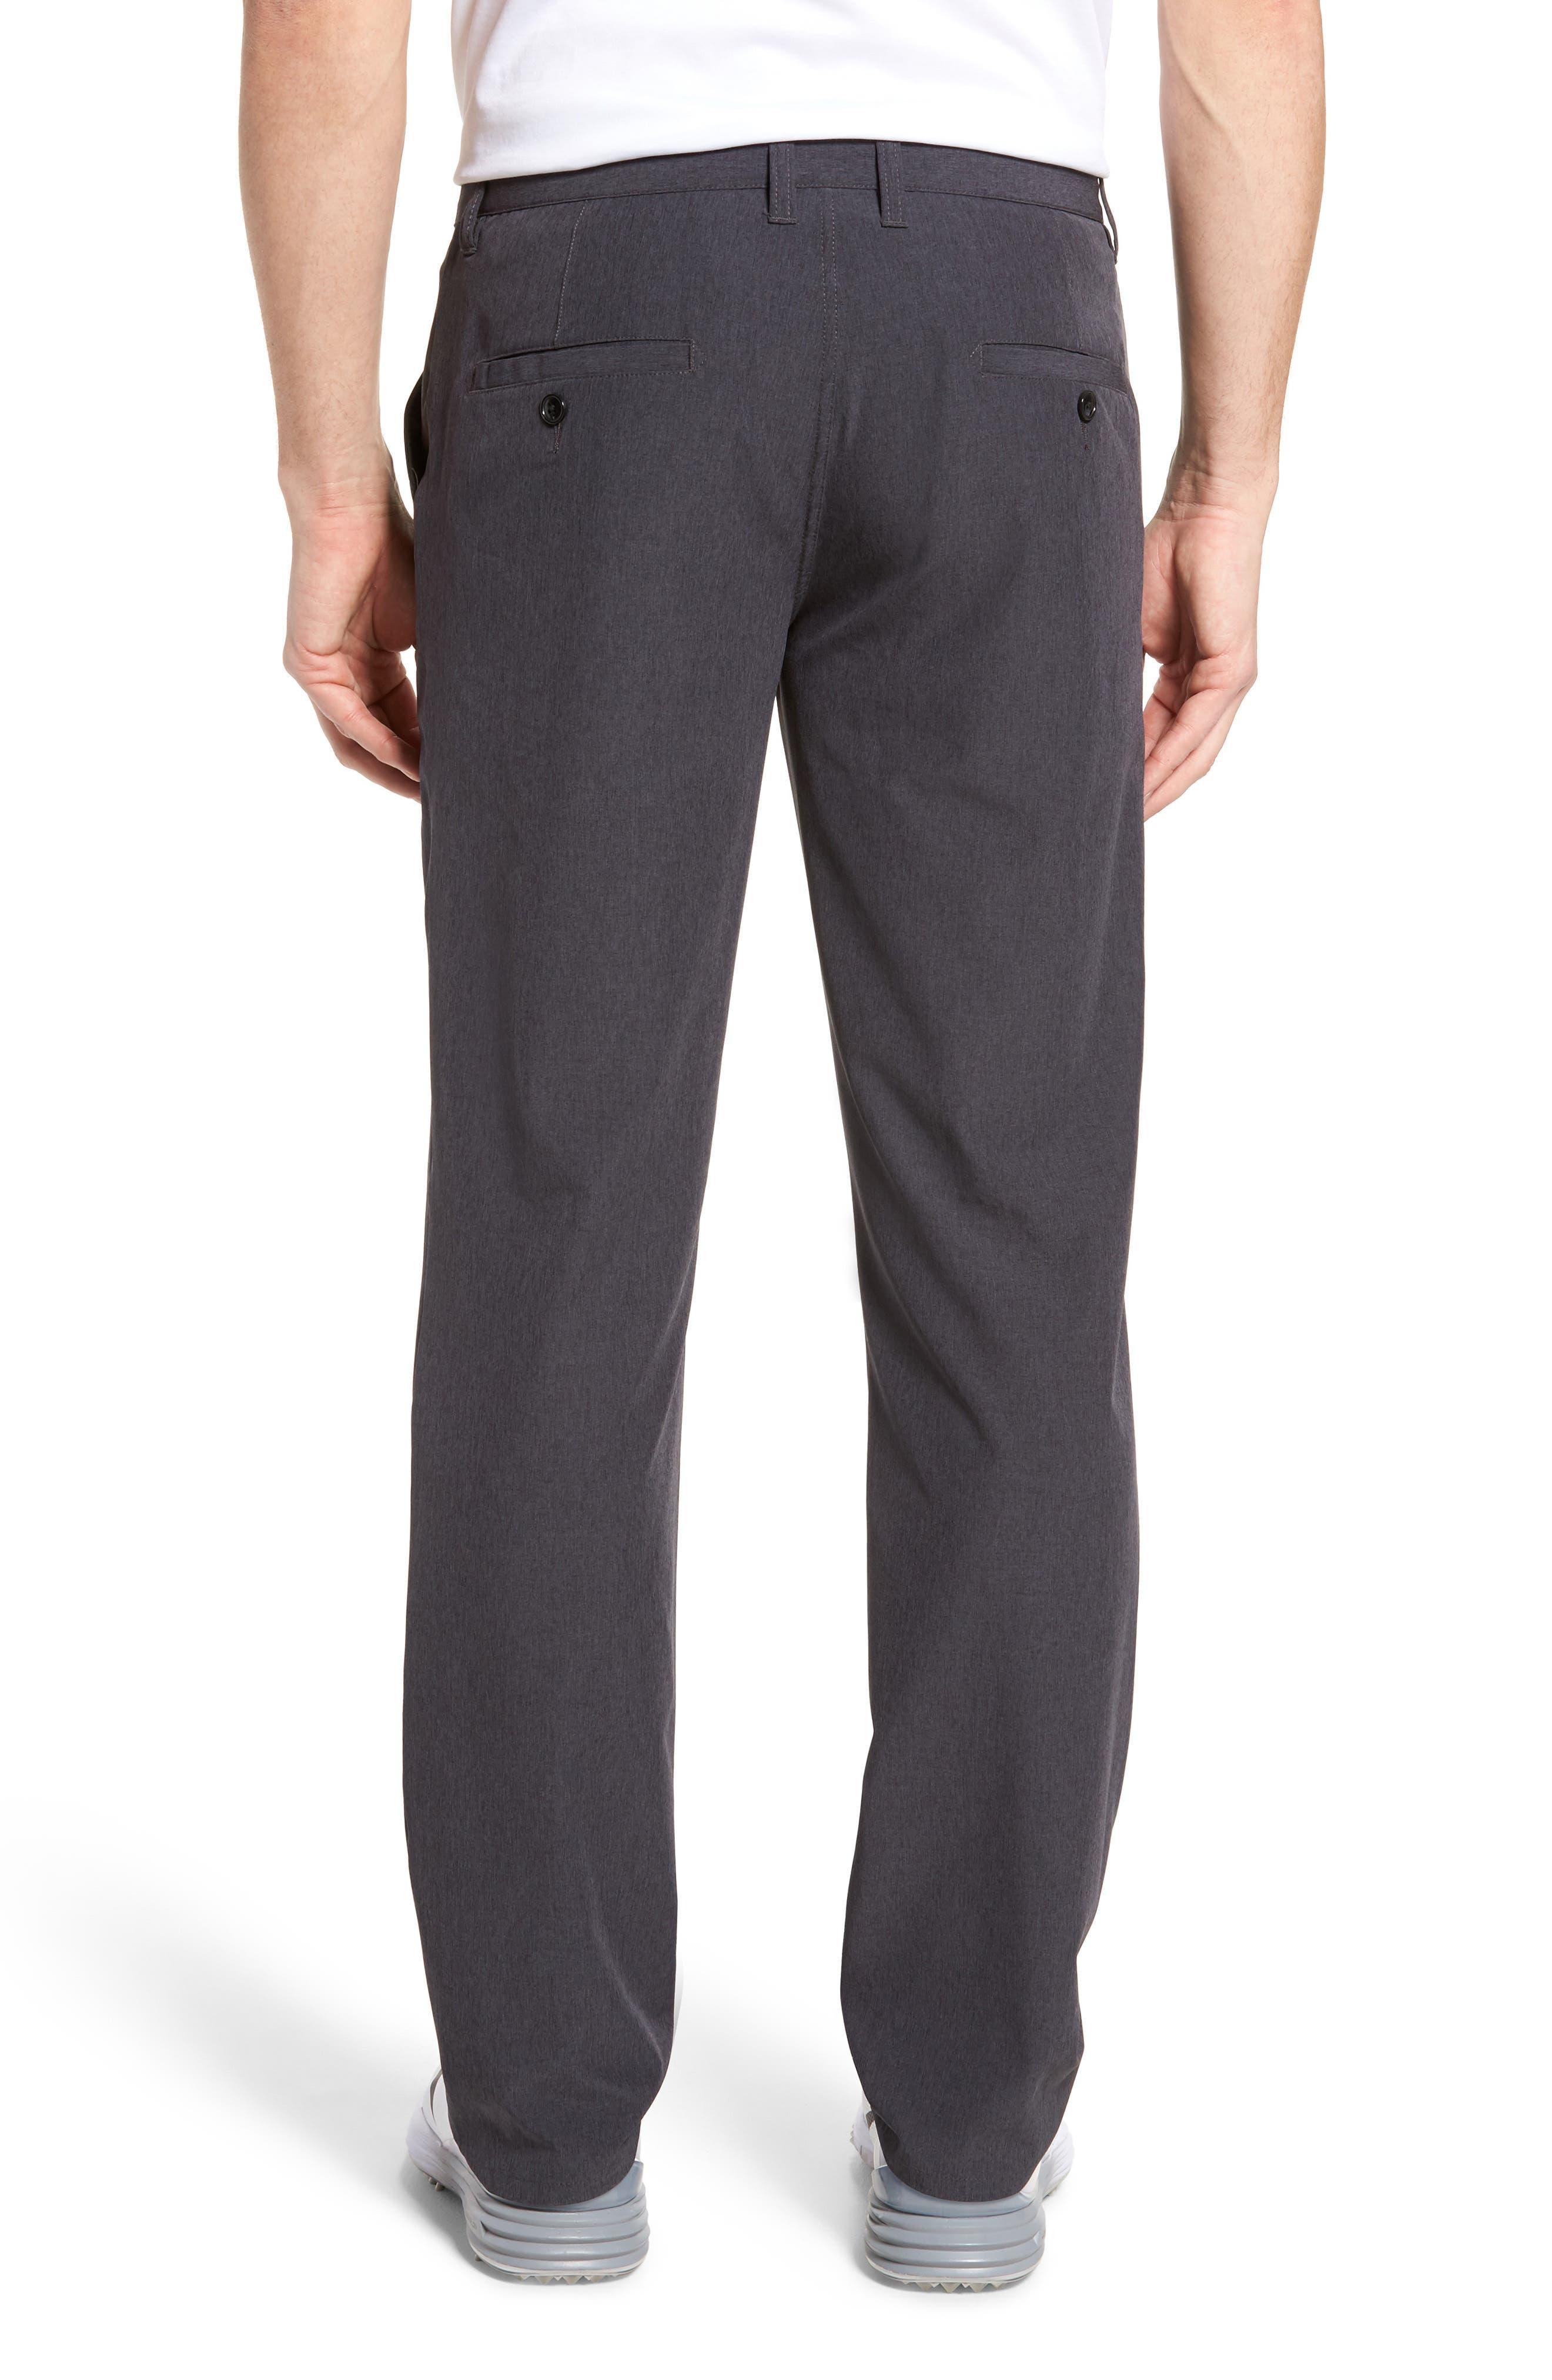 TRAVISMATHEW, Pantladdium Pants, Alternate thumbnail 2, color, HEATHER BLACK